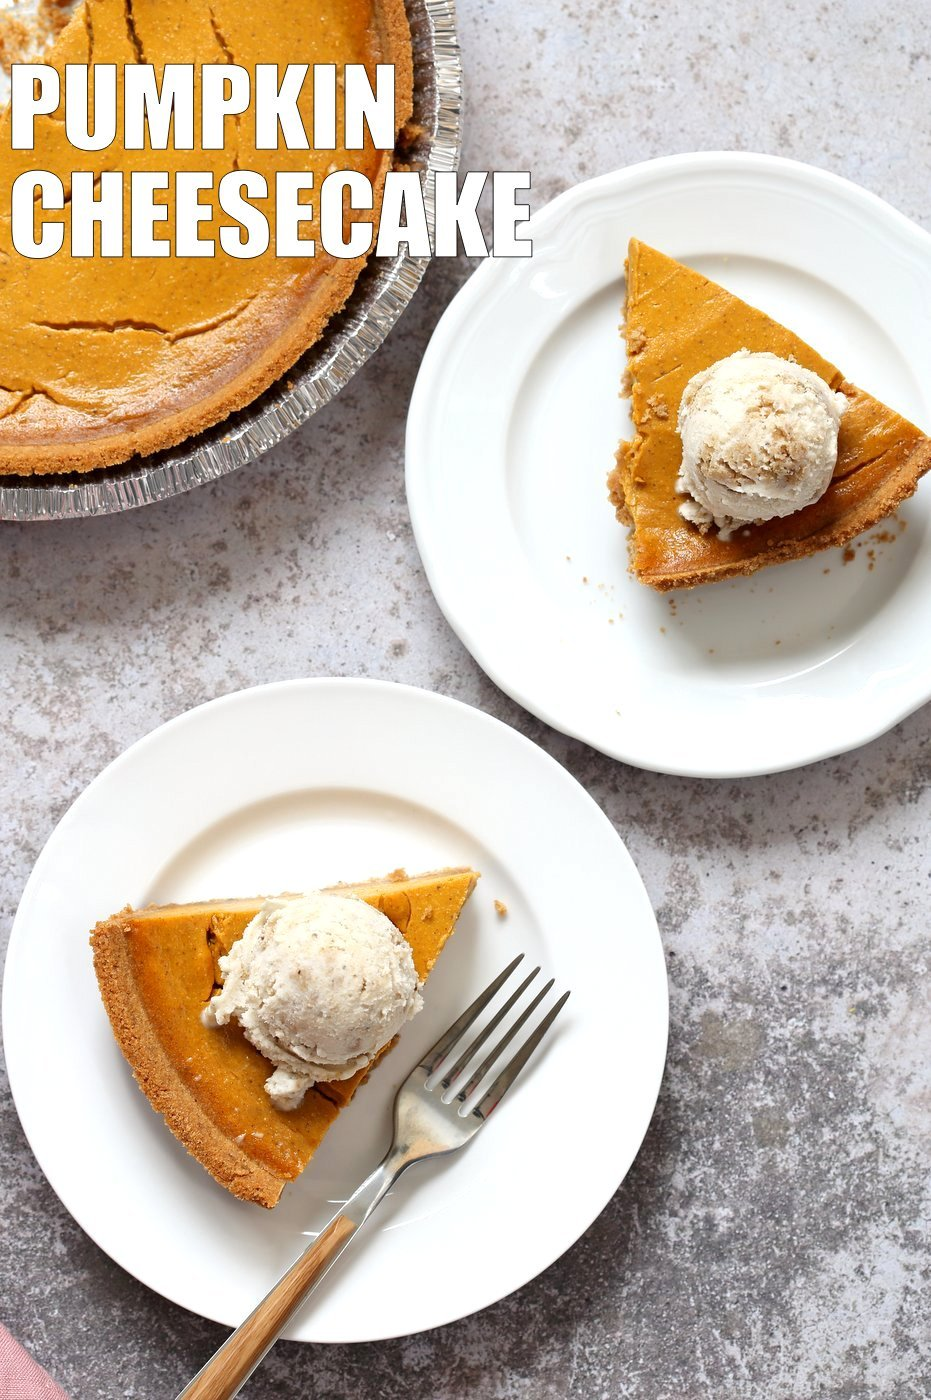 Vegan Pumpkin Cheesecake with graham cracker style crust. Easy Creamy Pumpkin Cheesecake to please everyone. Gluten-free with gluten free crust.# Soyfree #Recipe #vegan #pumpkinheesecake #veganricha | VeganRicha.com